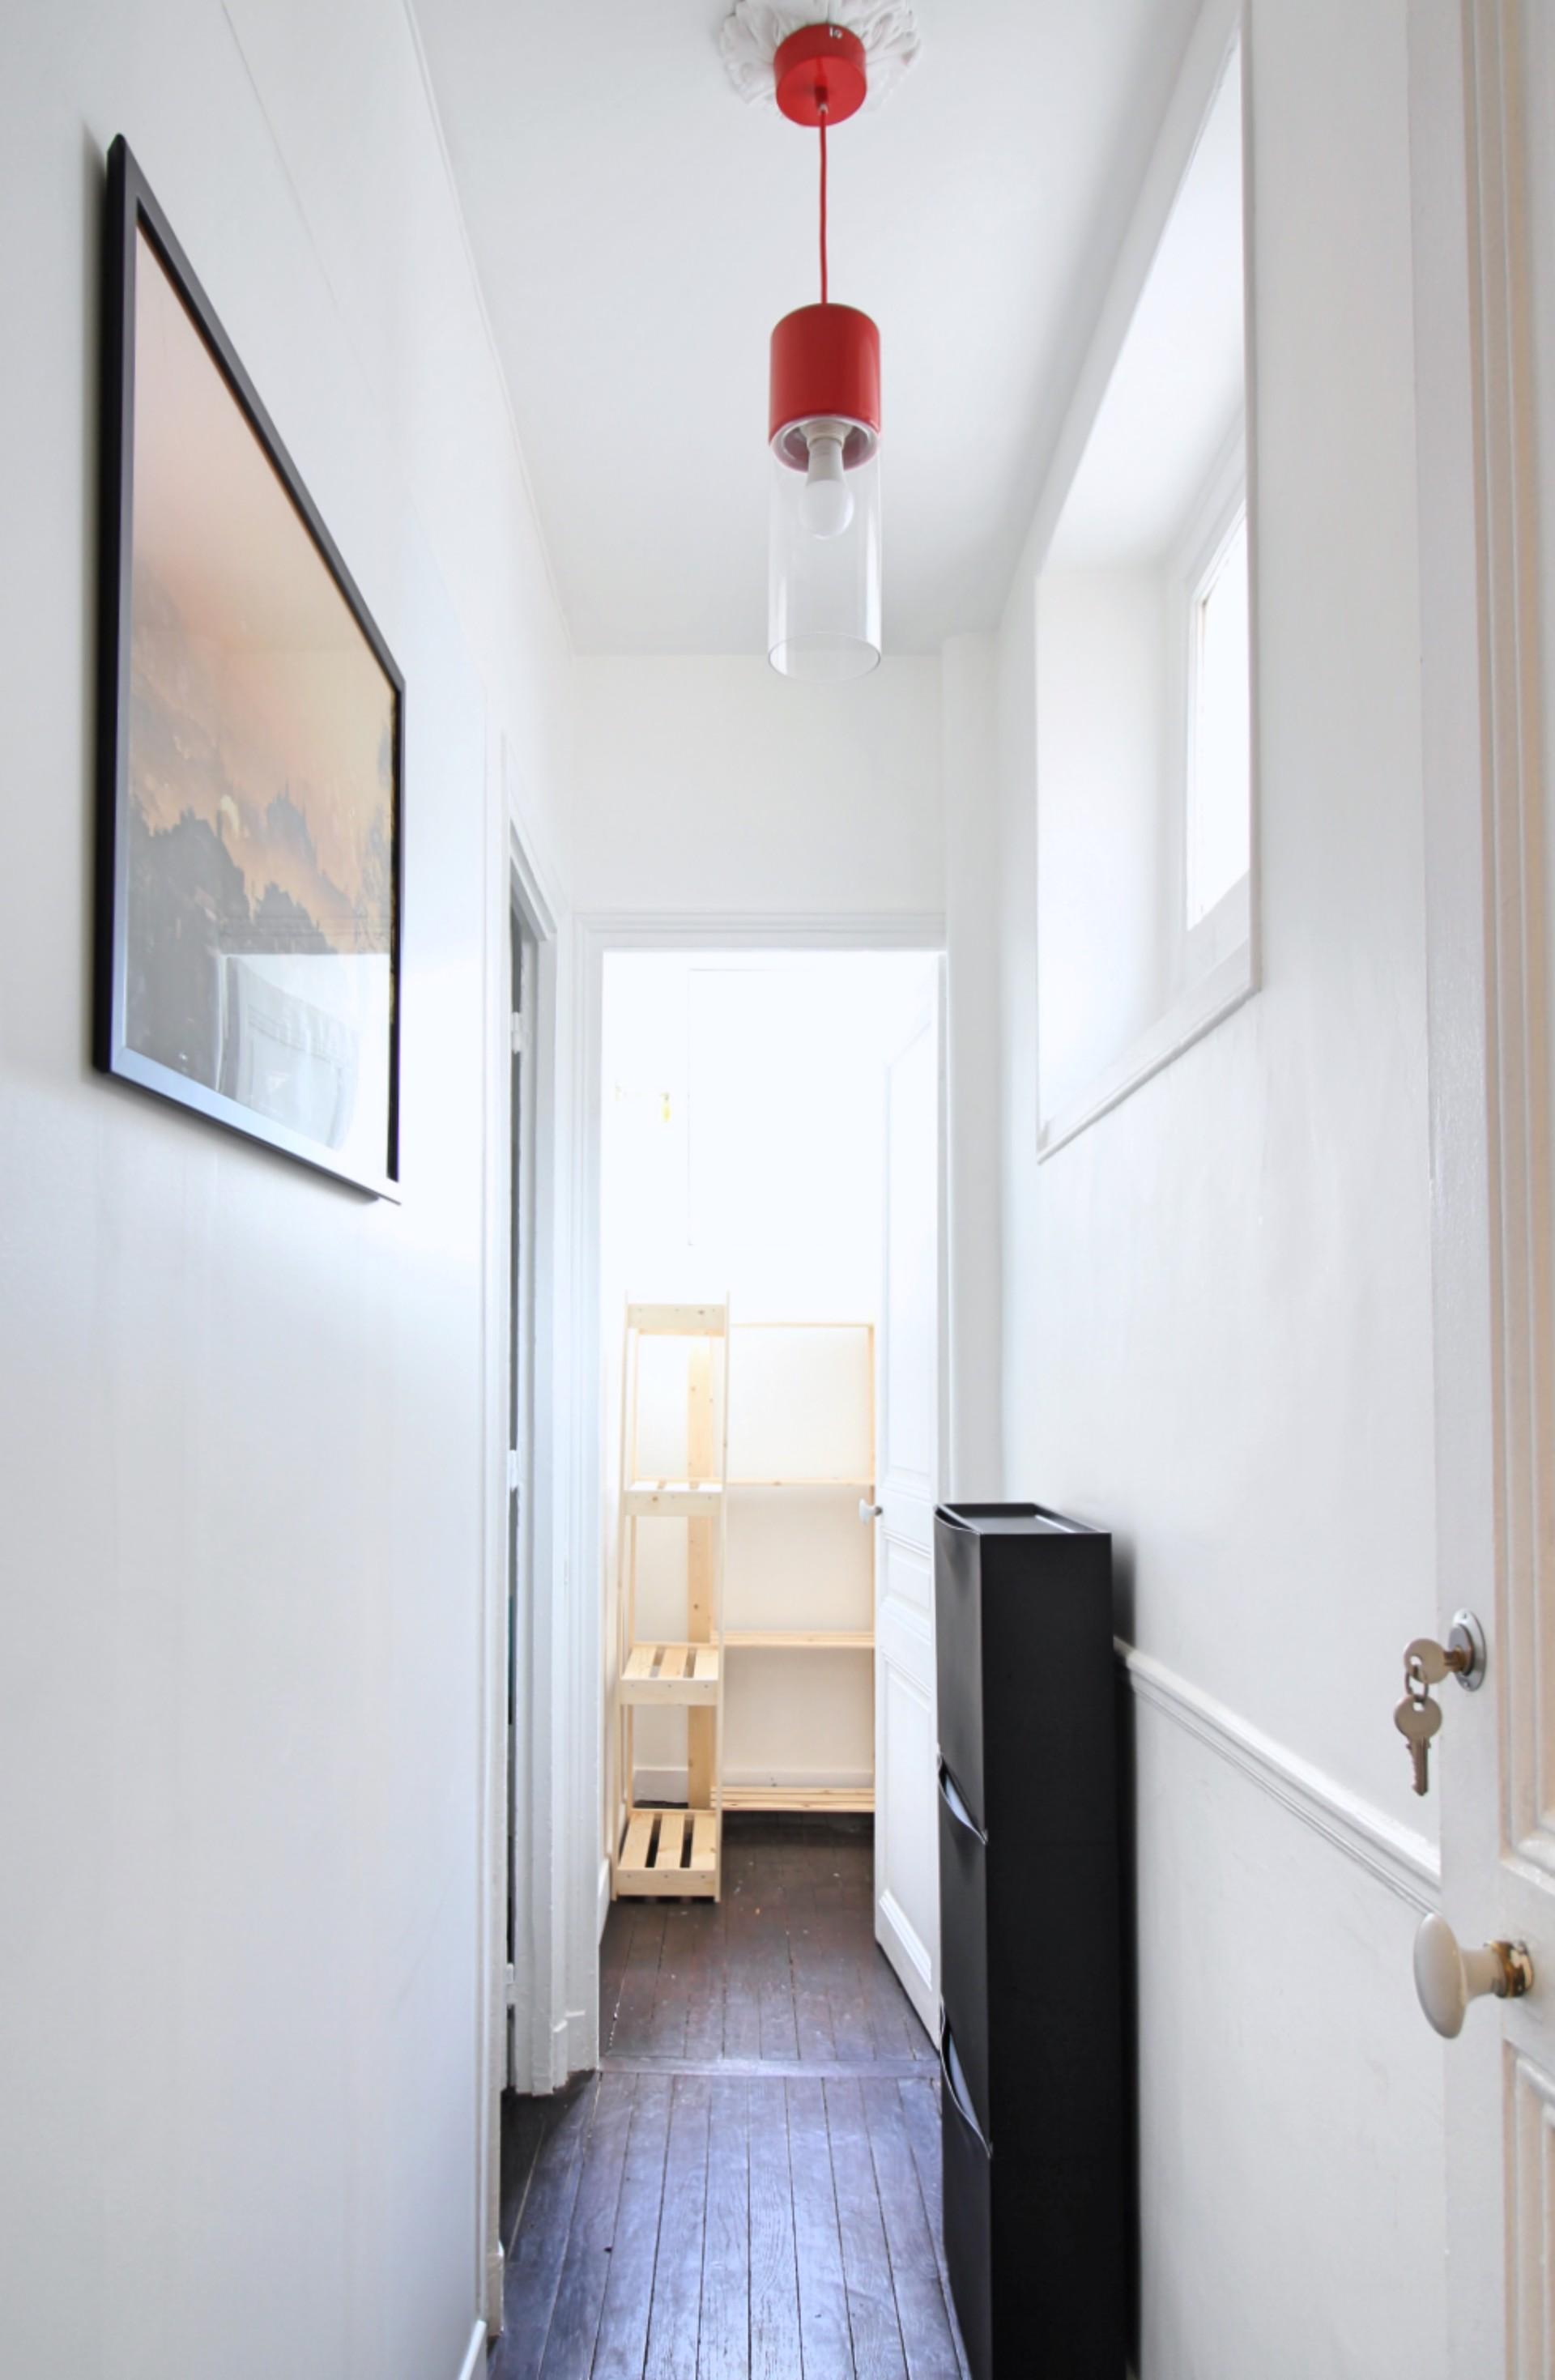 Piece A Vivre Parquet room for rent in paris: share this comfortable apartment